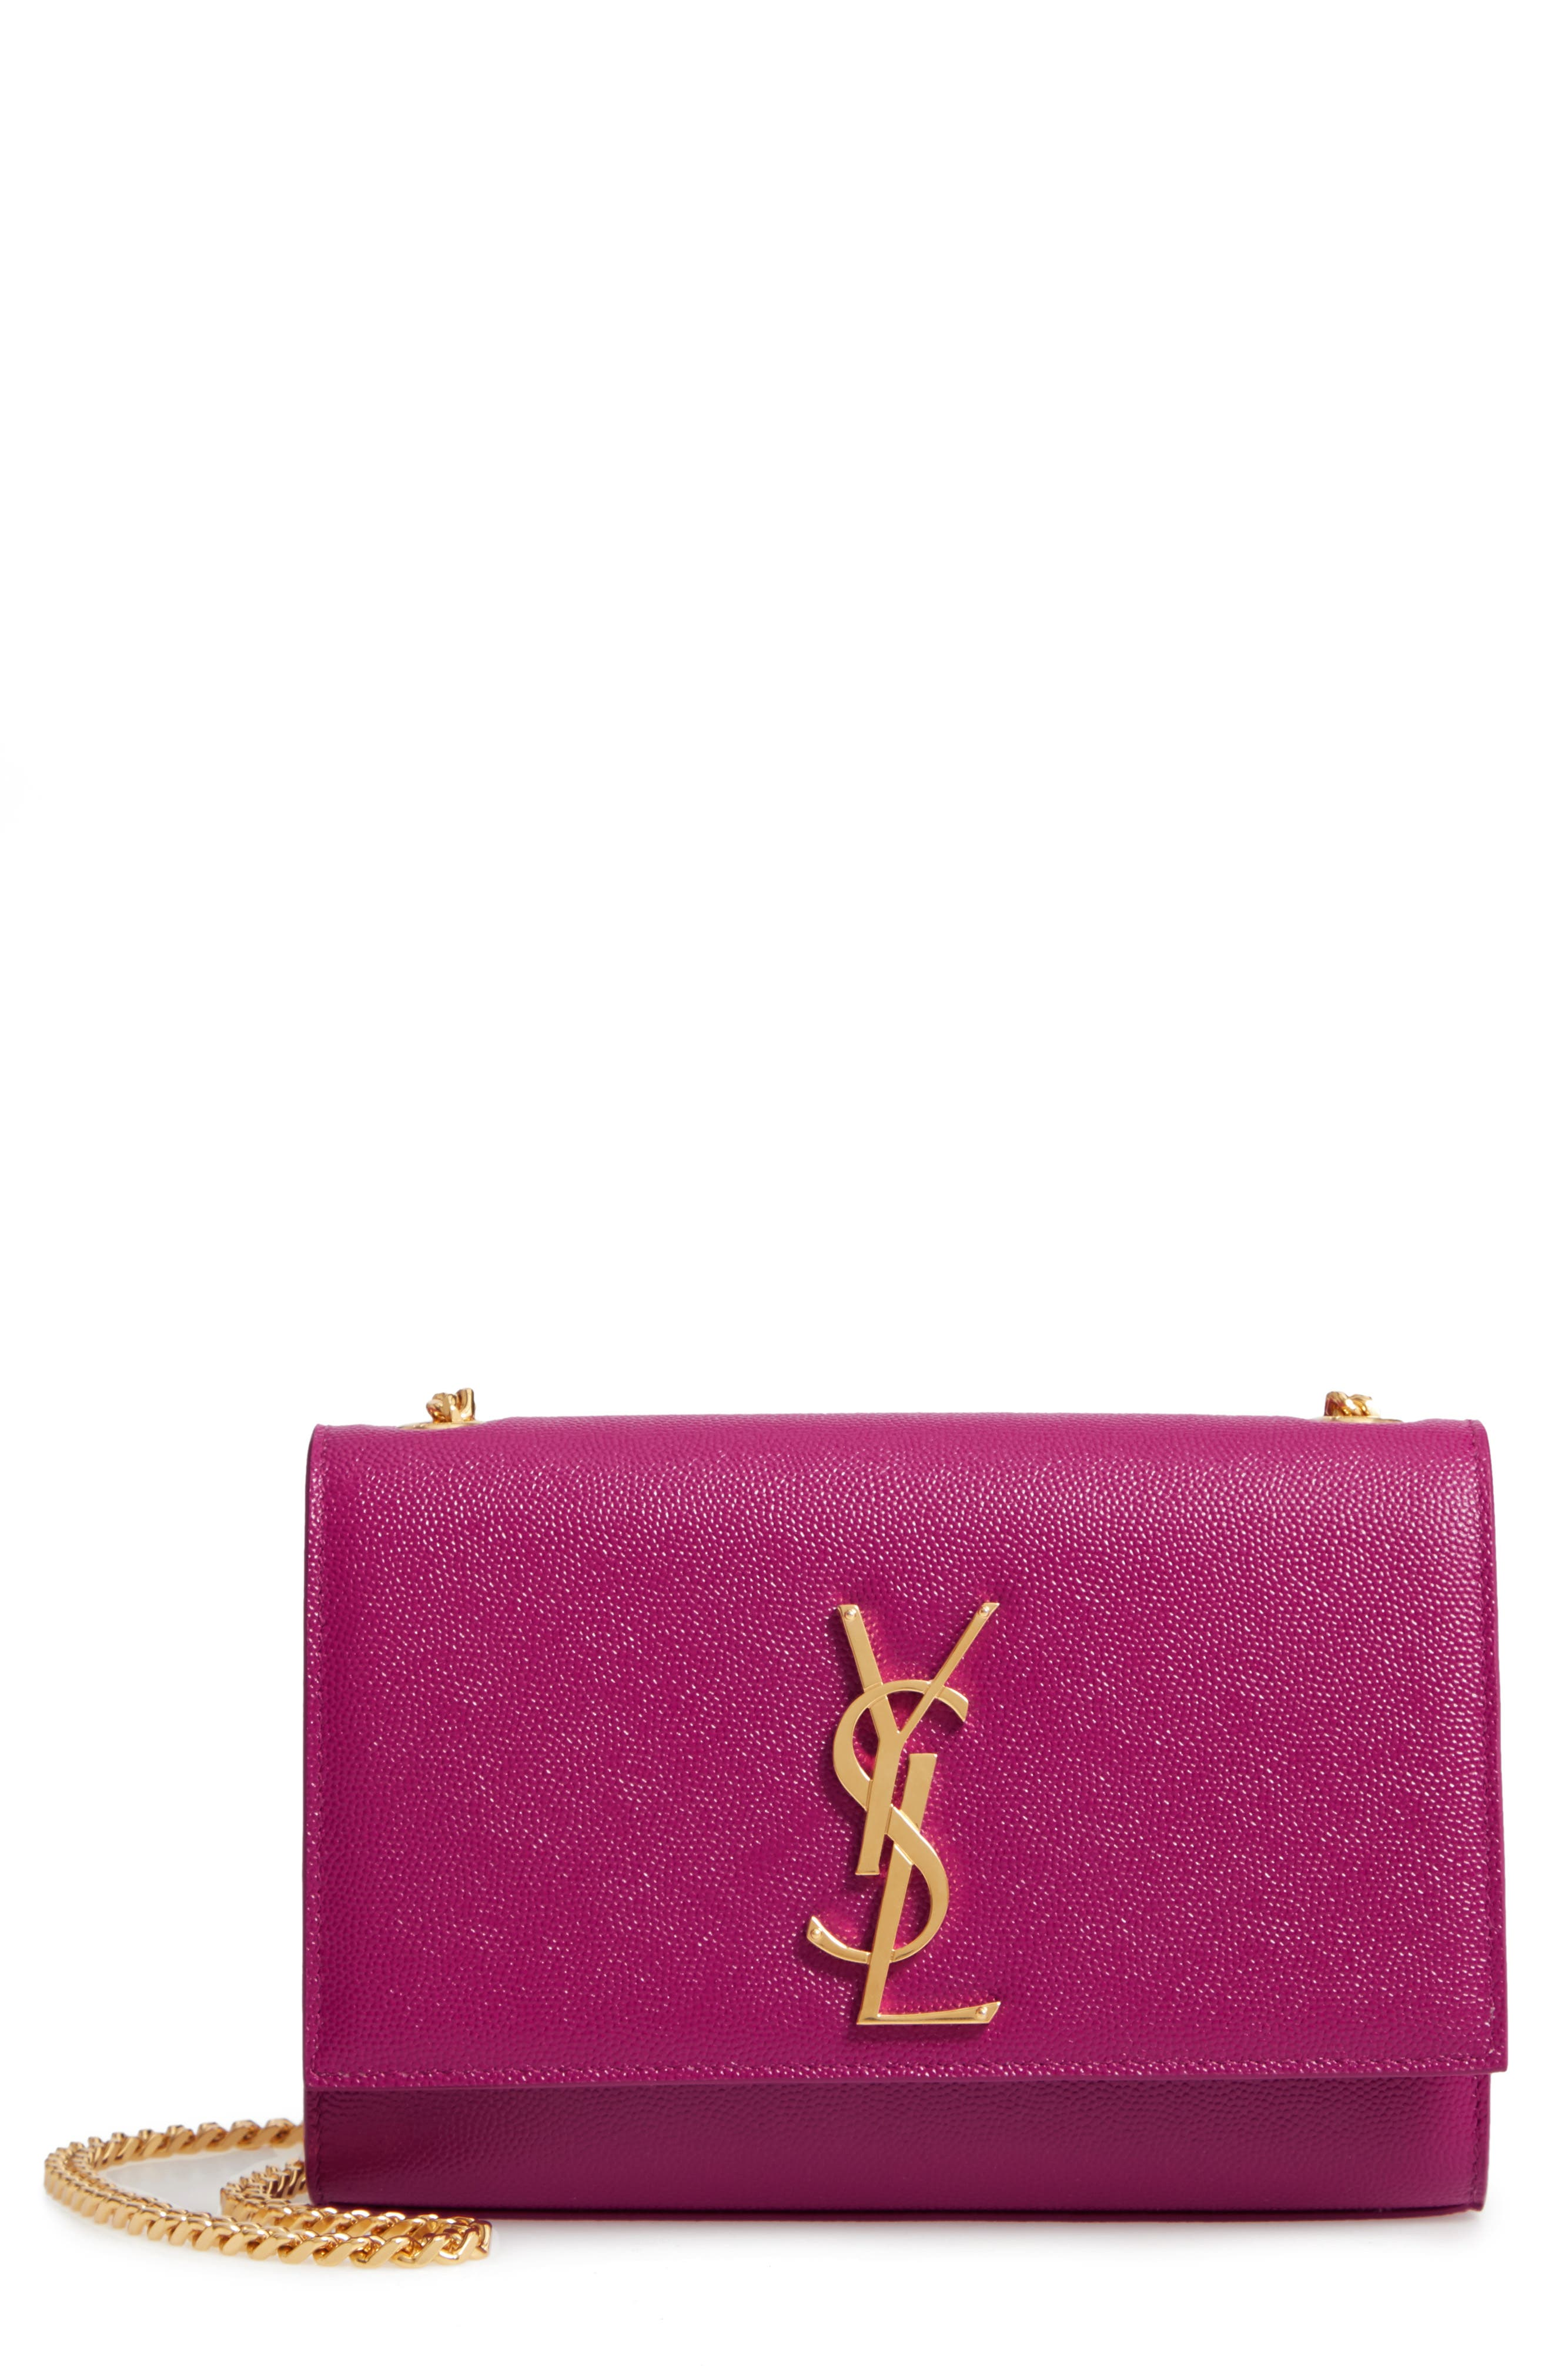 SAINT LAURENT, Small Kate Chain Crossbody Bag, Main thumbnail 1, color, LIGHT GRAPE